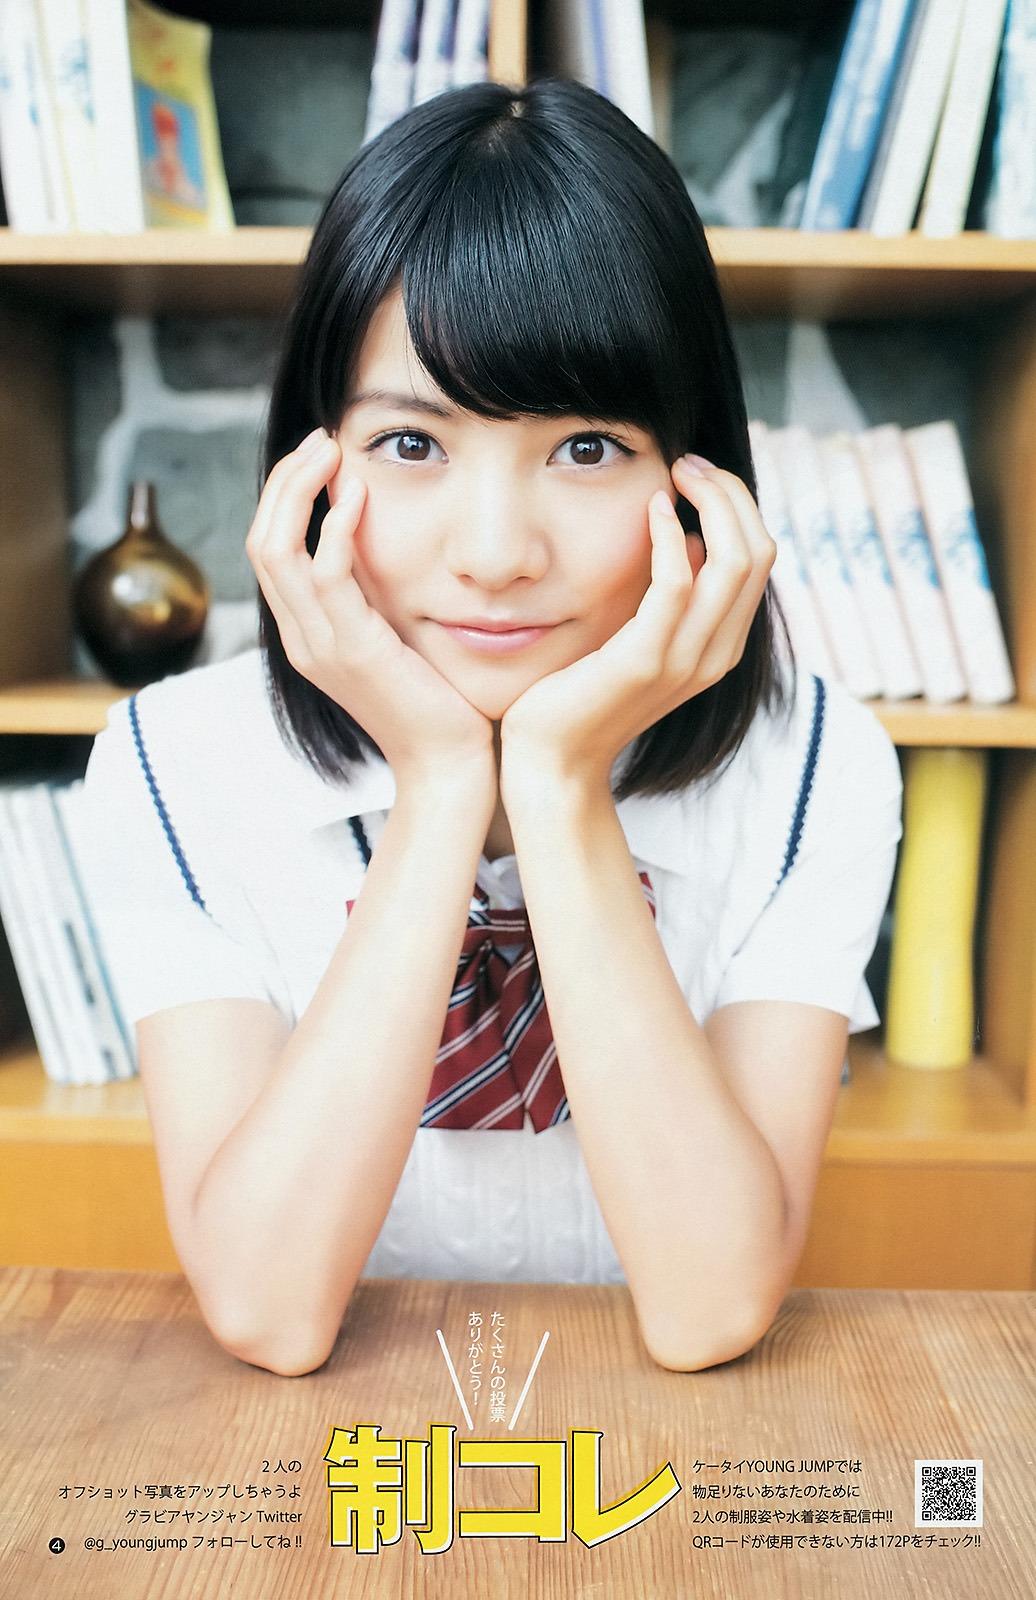 eyval.net: おのえれな, 小野恵令奈, Ono Erena - Weekly SPA!, 2013.05.10